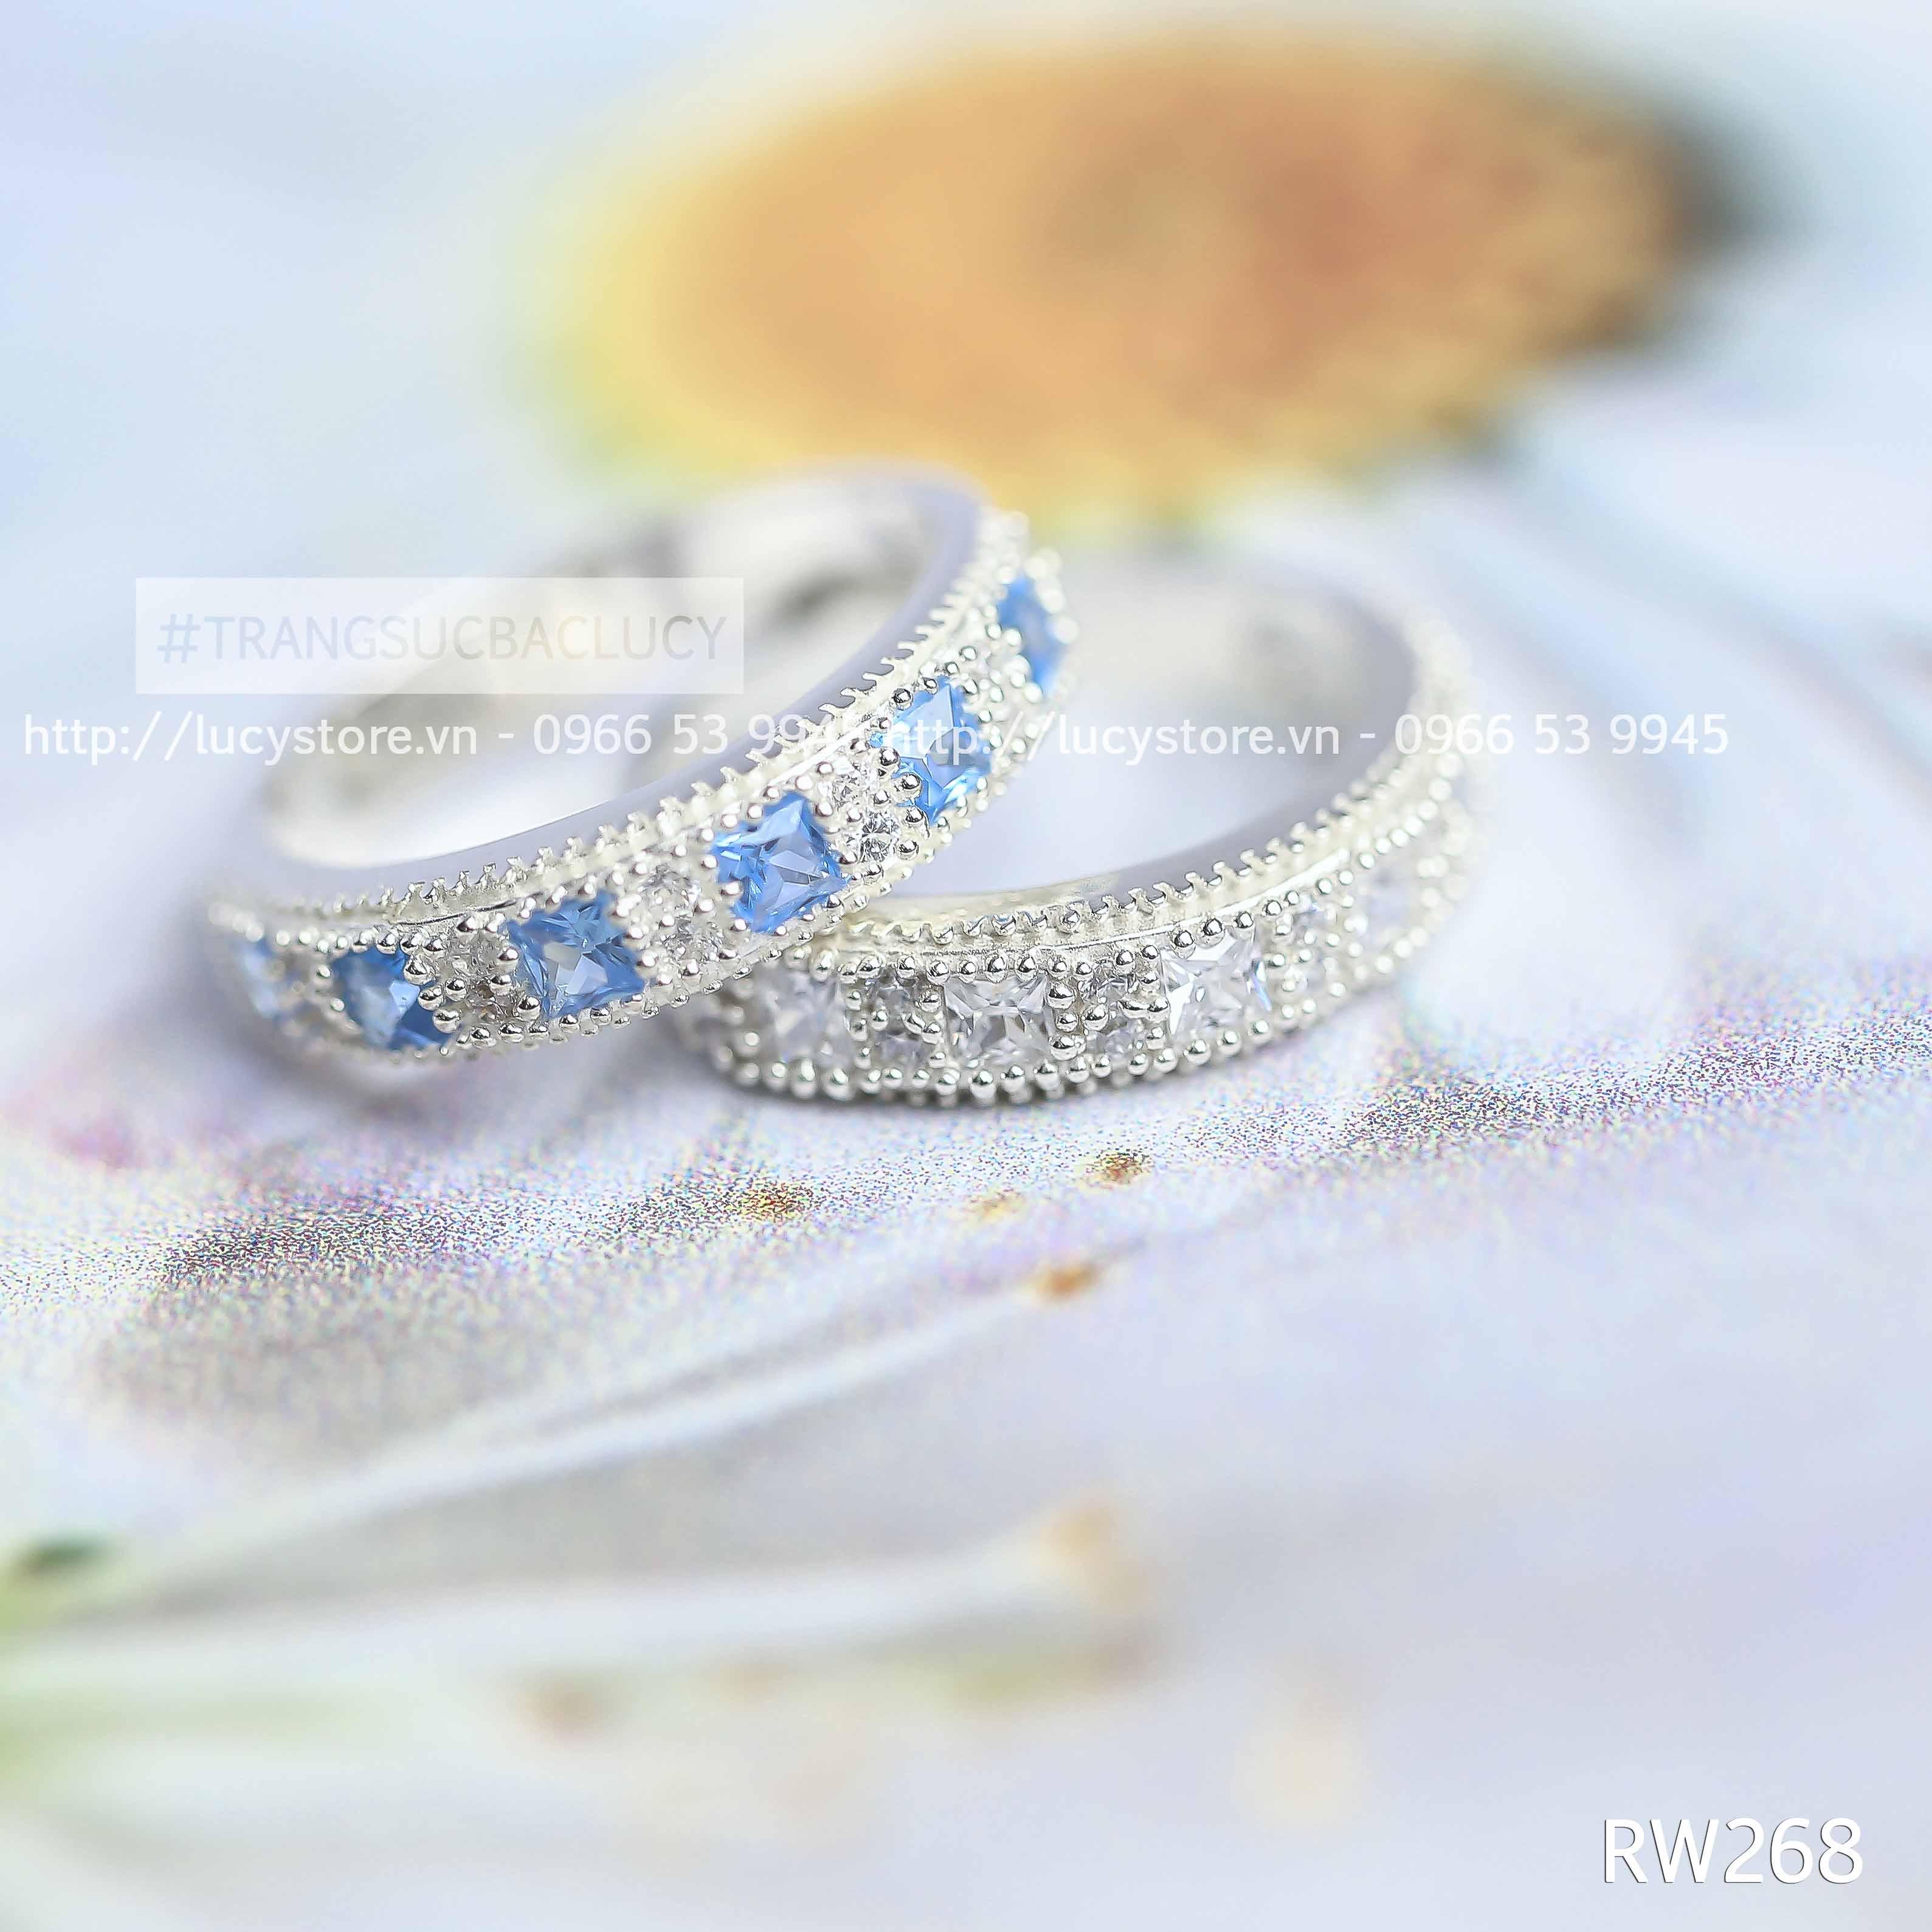 Nhẫn nữ bạc LUCY - RW268